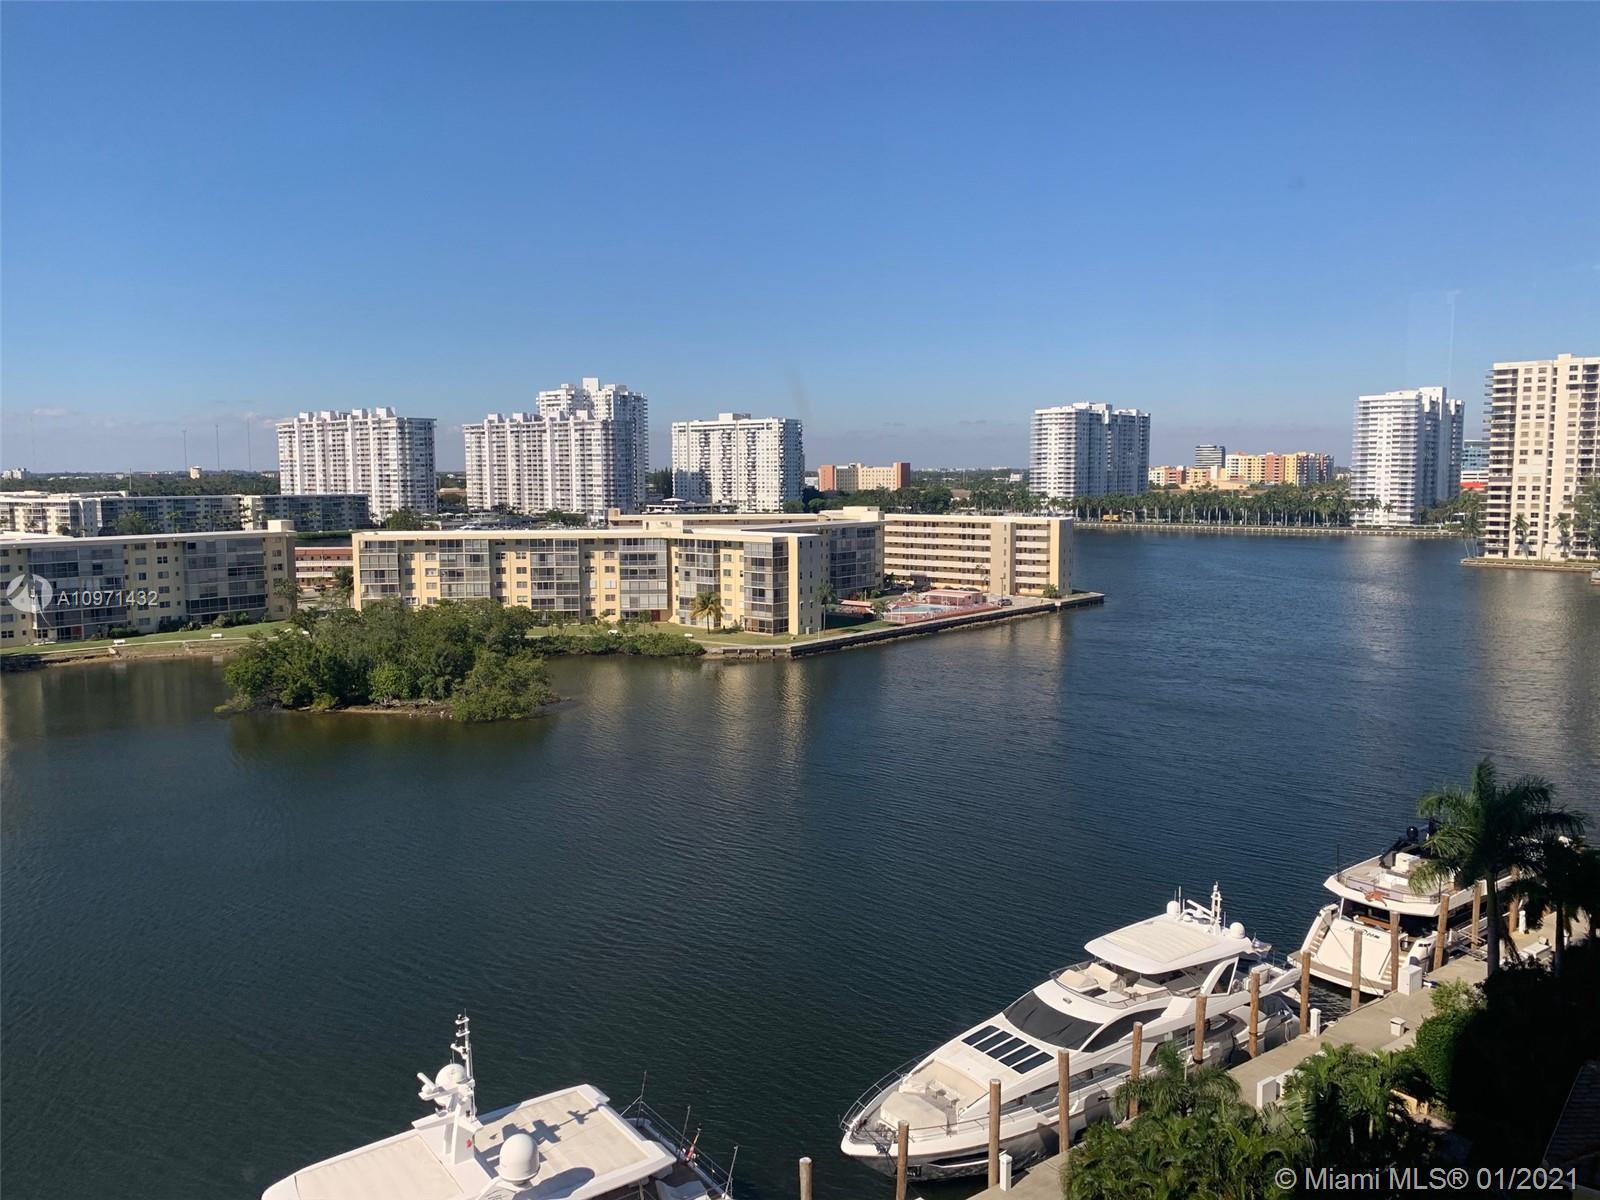 1000 Williams Island #1009 - 1000 W Island Blvd #1009, Aventura, FL 33160